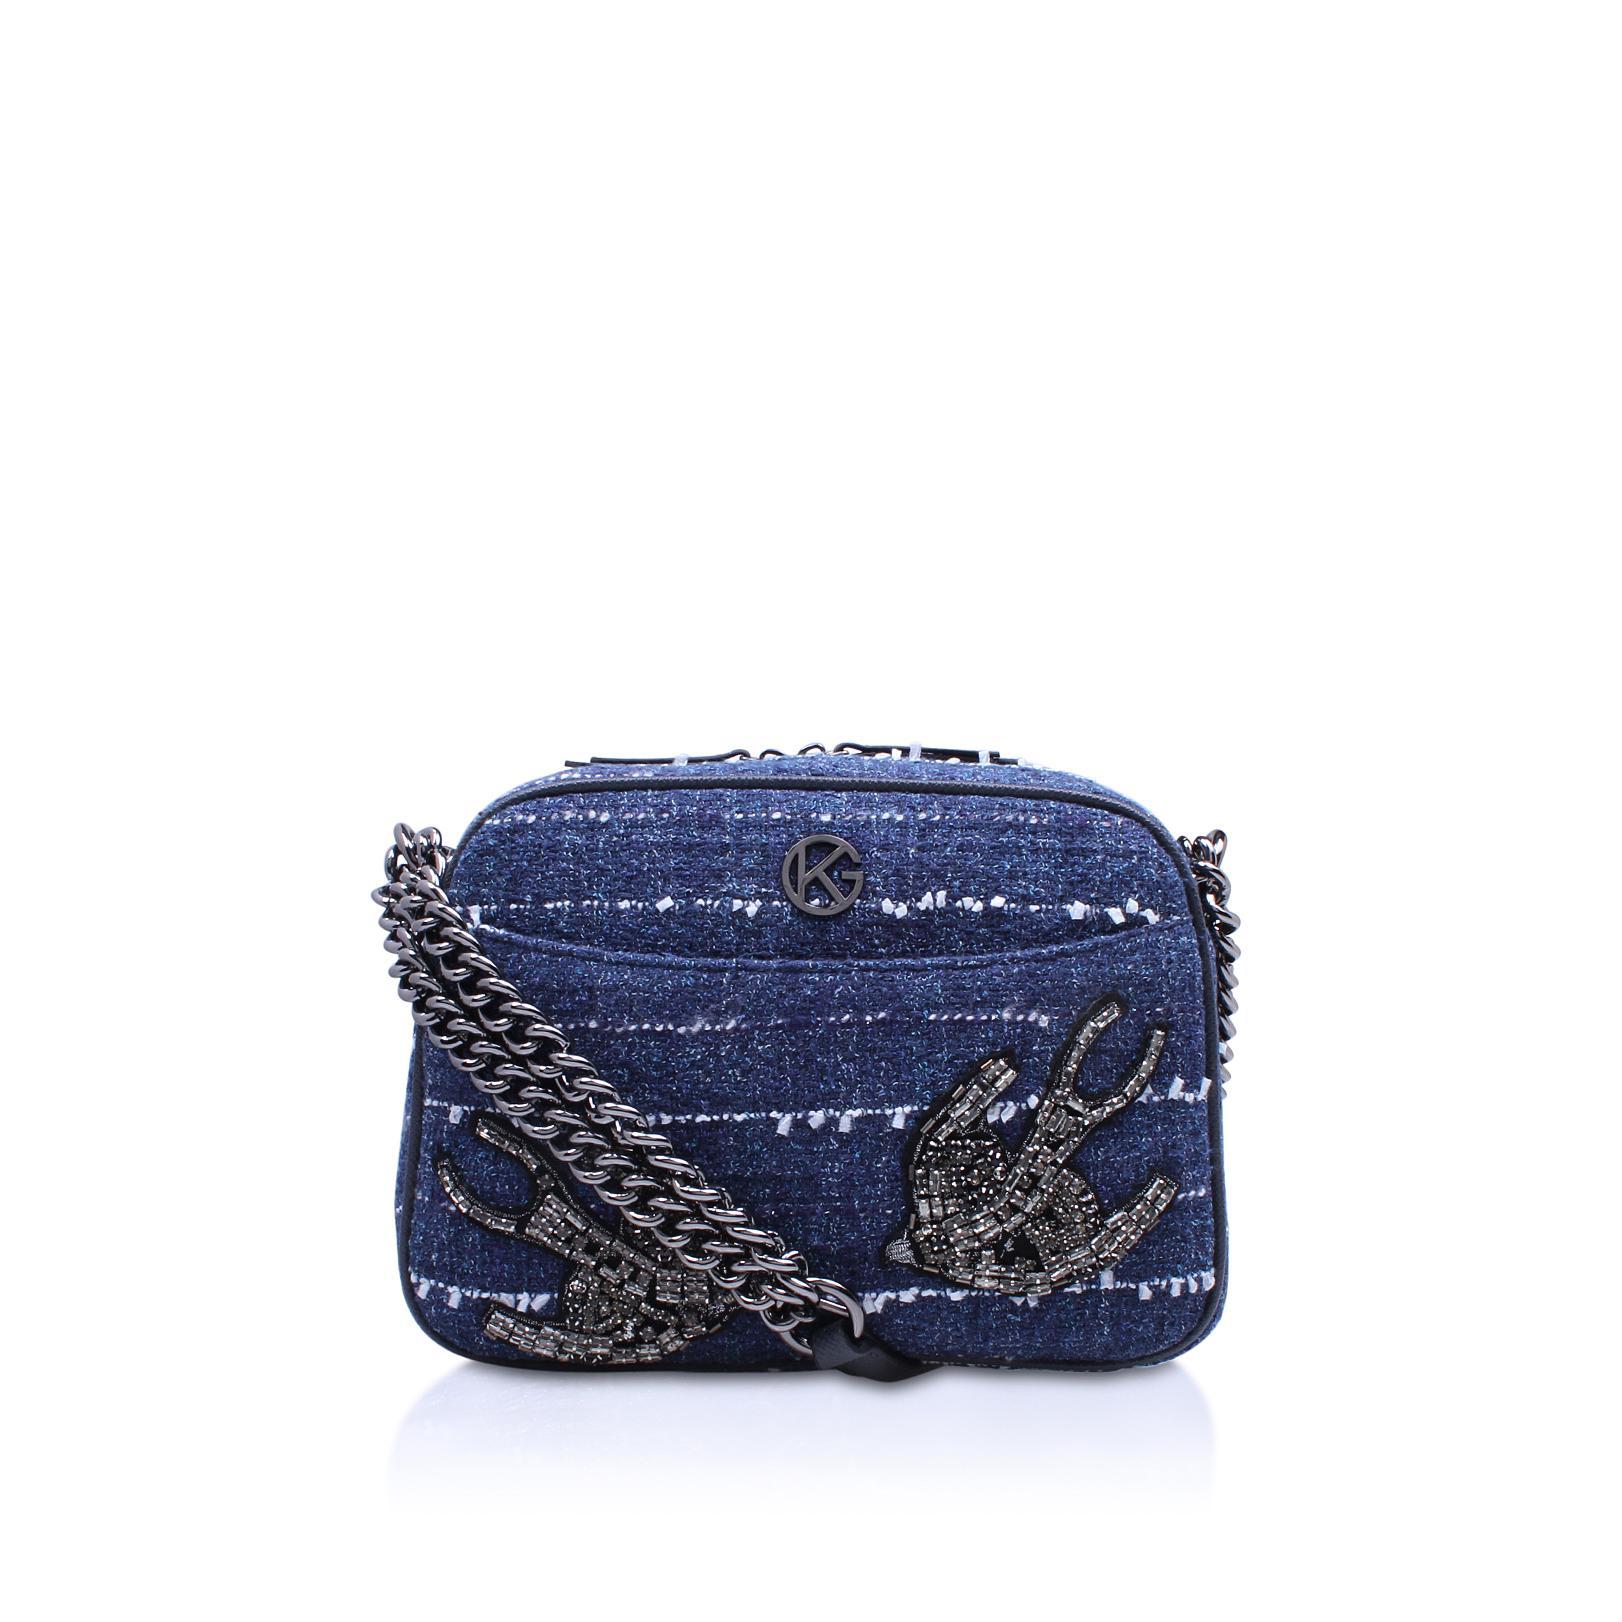 Kurt Geiger Denim Blue Tweed Cross Body Bag In Blue Lyst